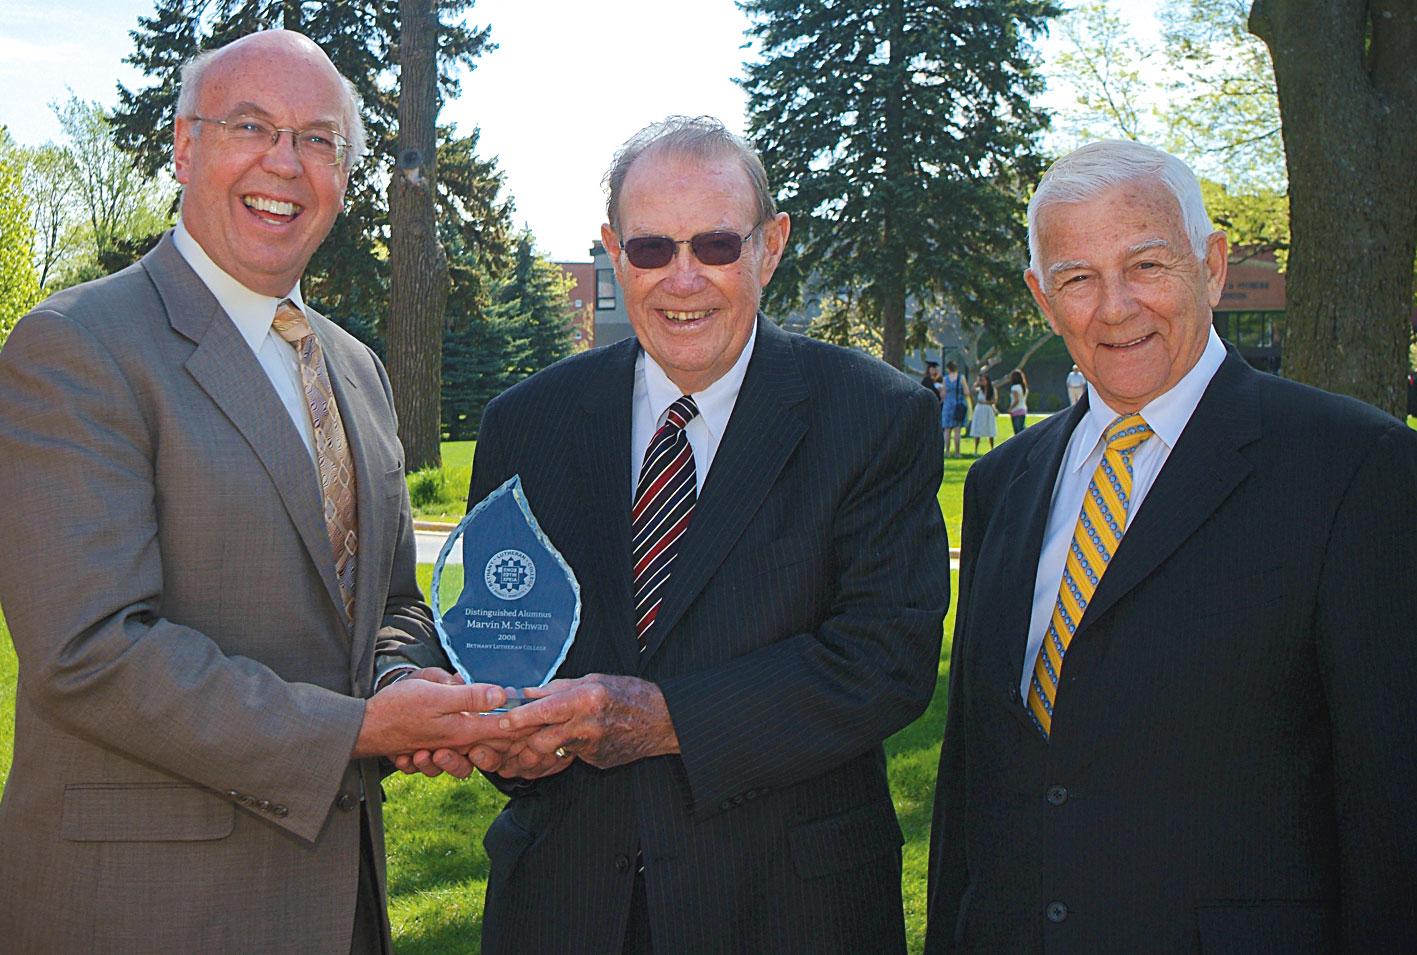 From left: President Dan Bruss, Alfred Schwan, and commencement speaker Rev. Larry Burgdorf. (2008)